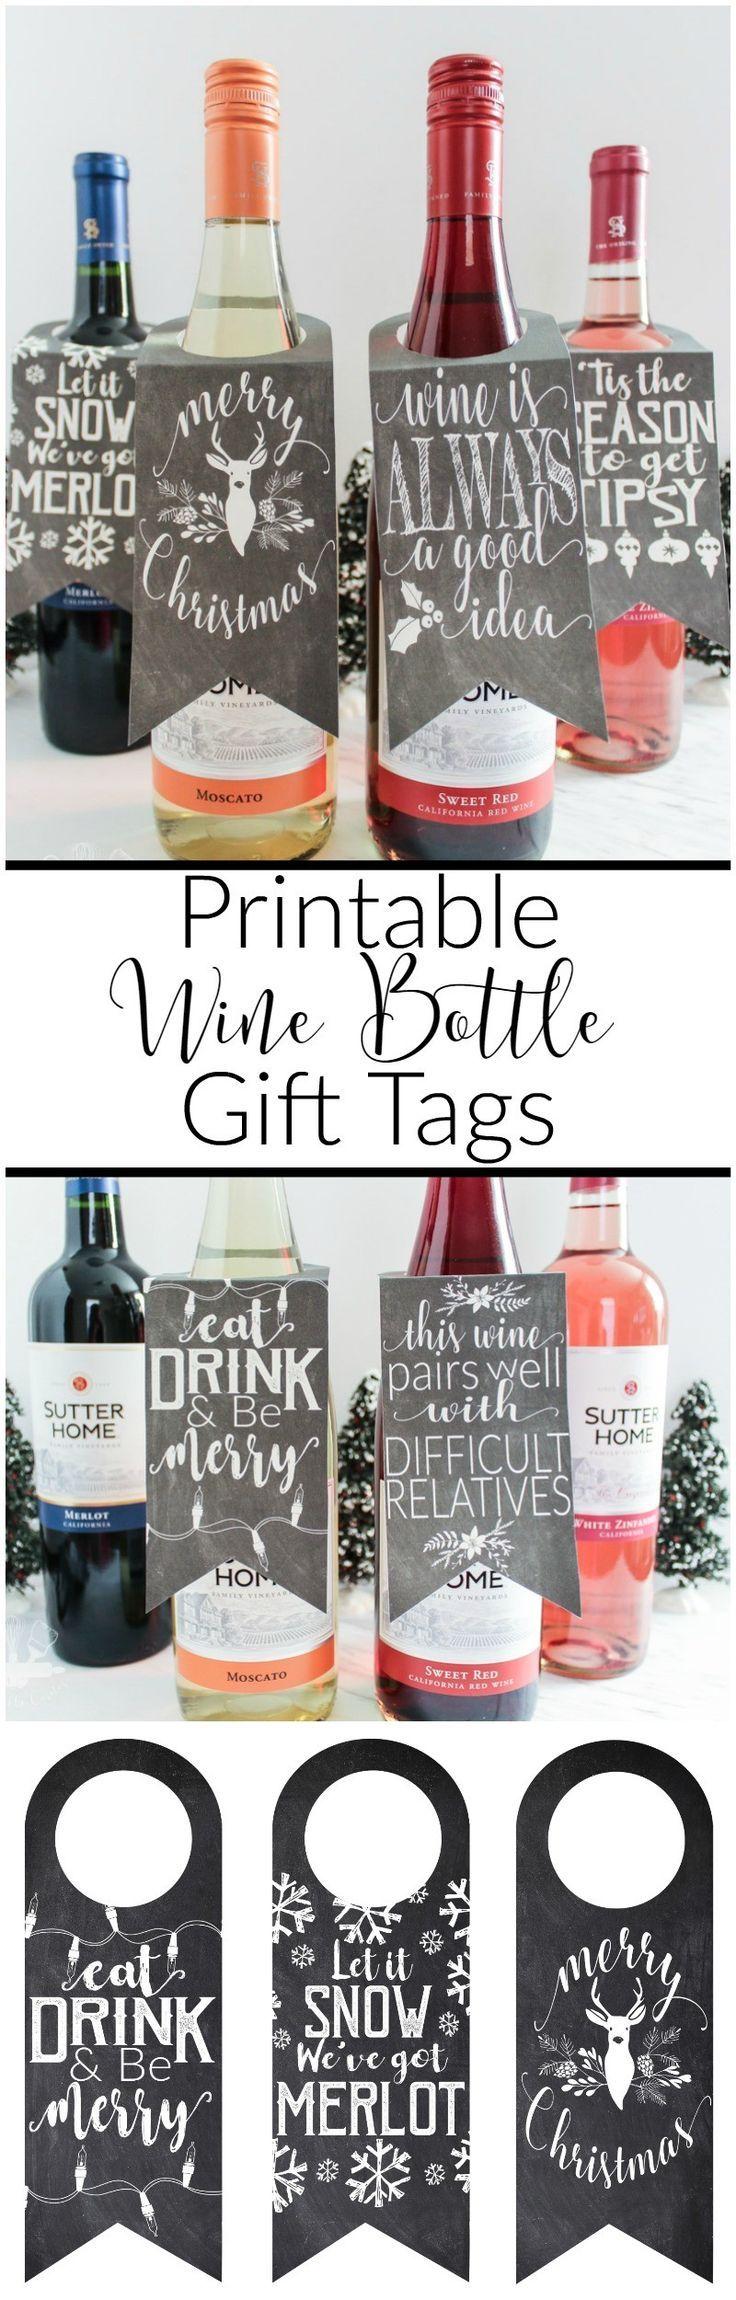 Printable Wine Bottle Gift Tags | Wine bottle gift, Wine and Bottle